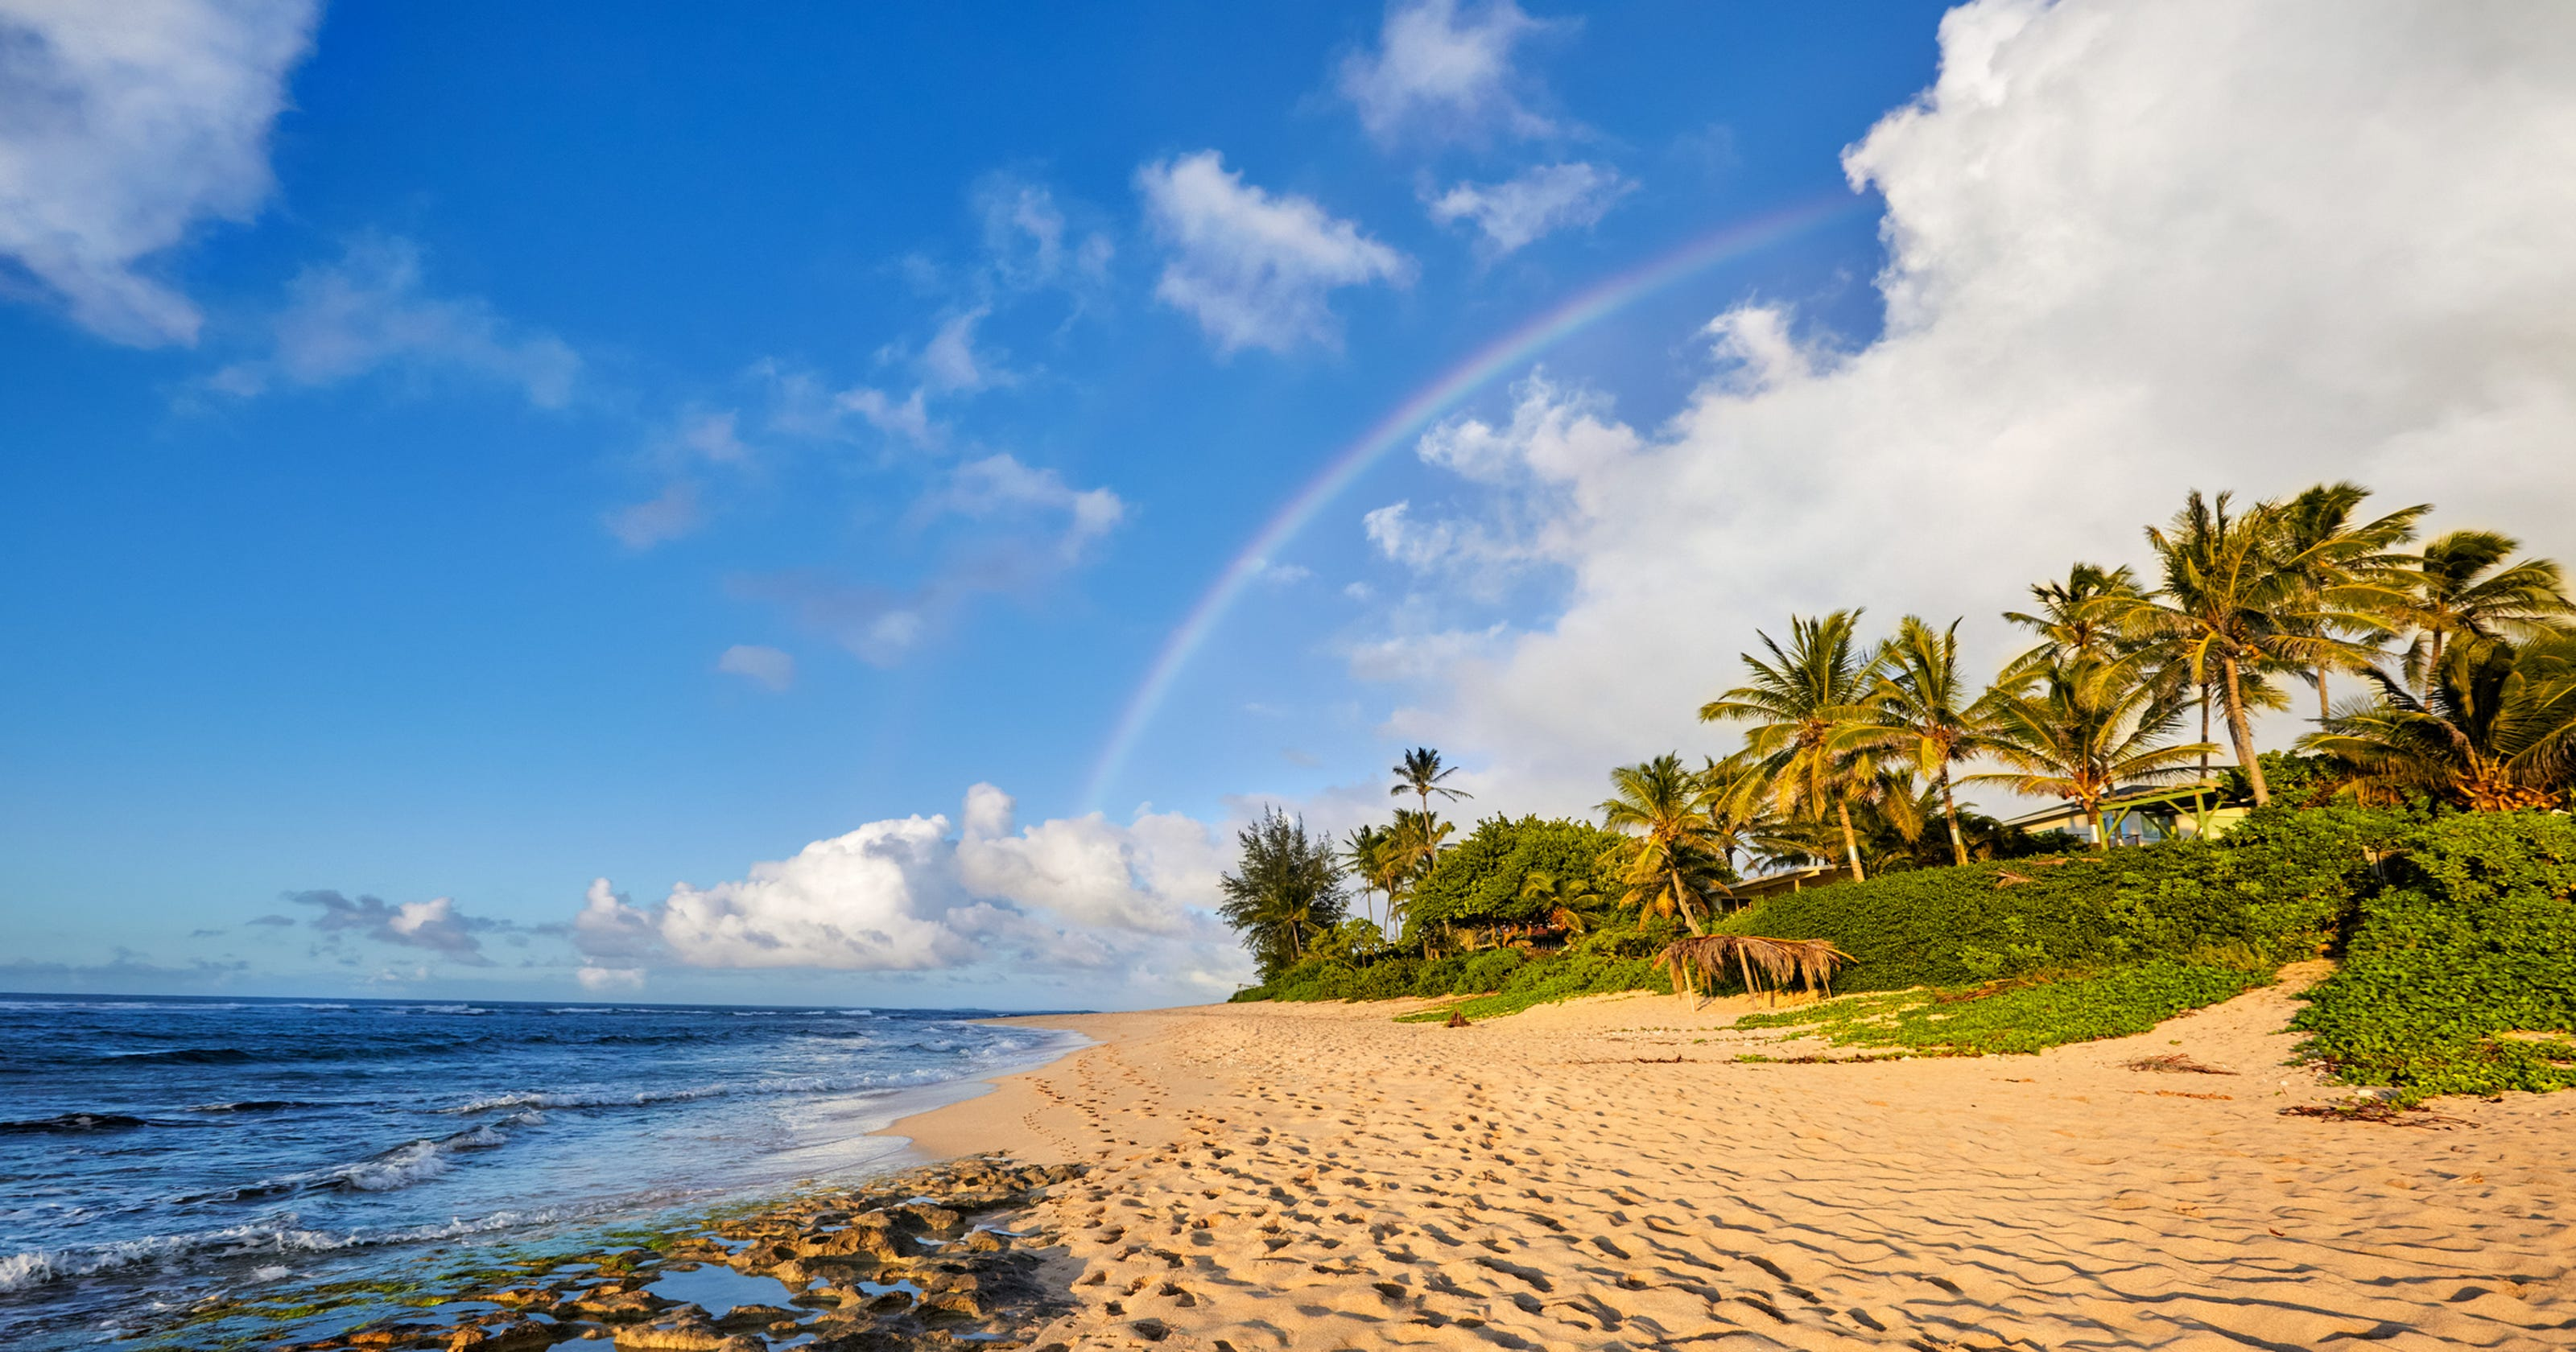 The 20 top trending US beach destinations on Pinterest